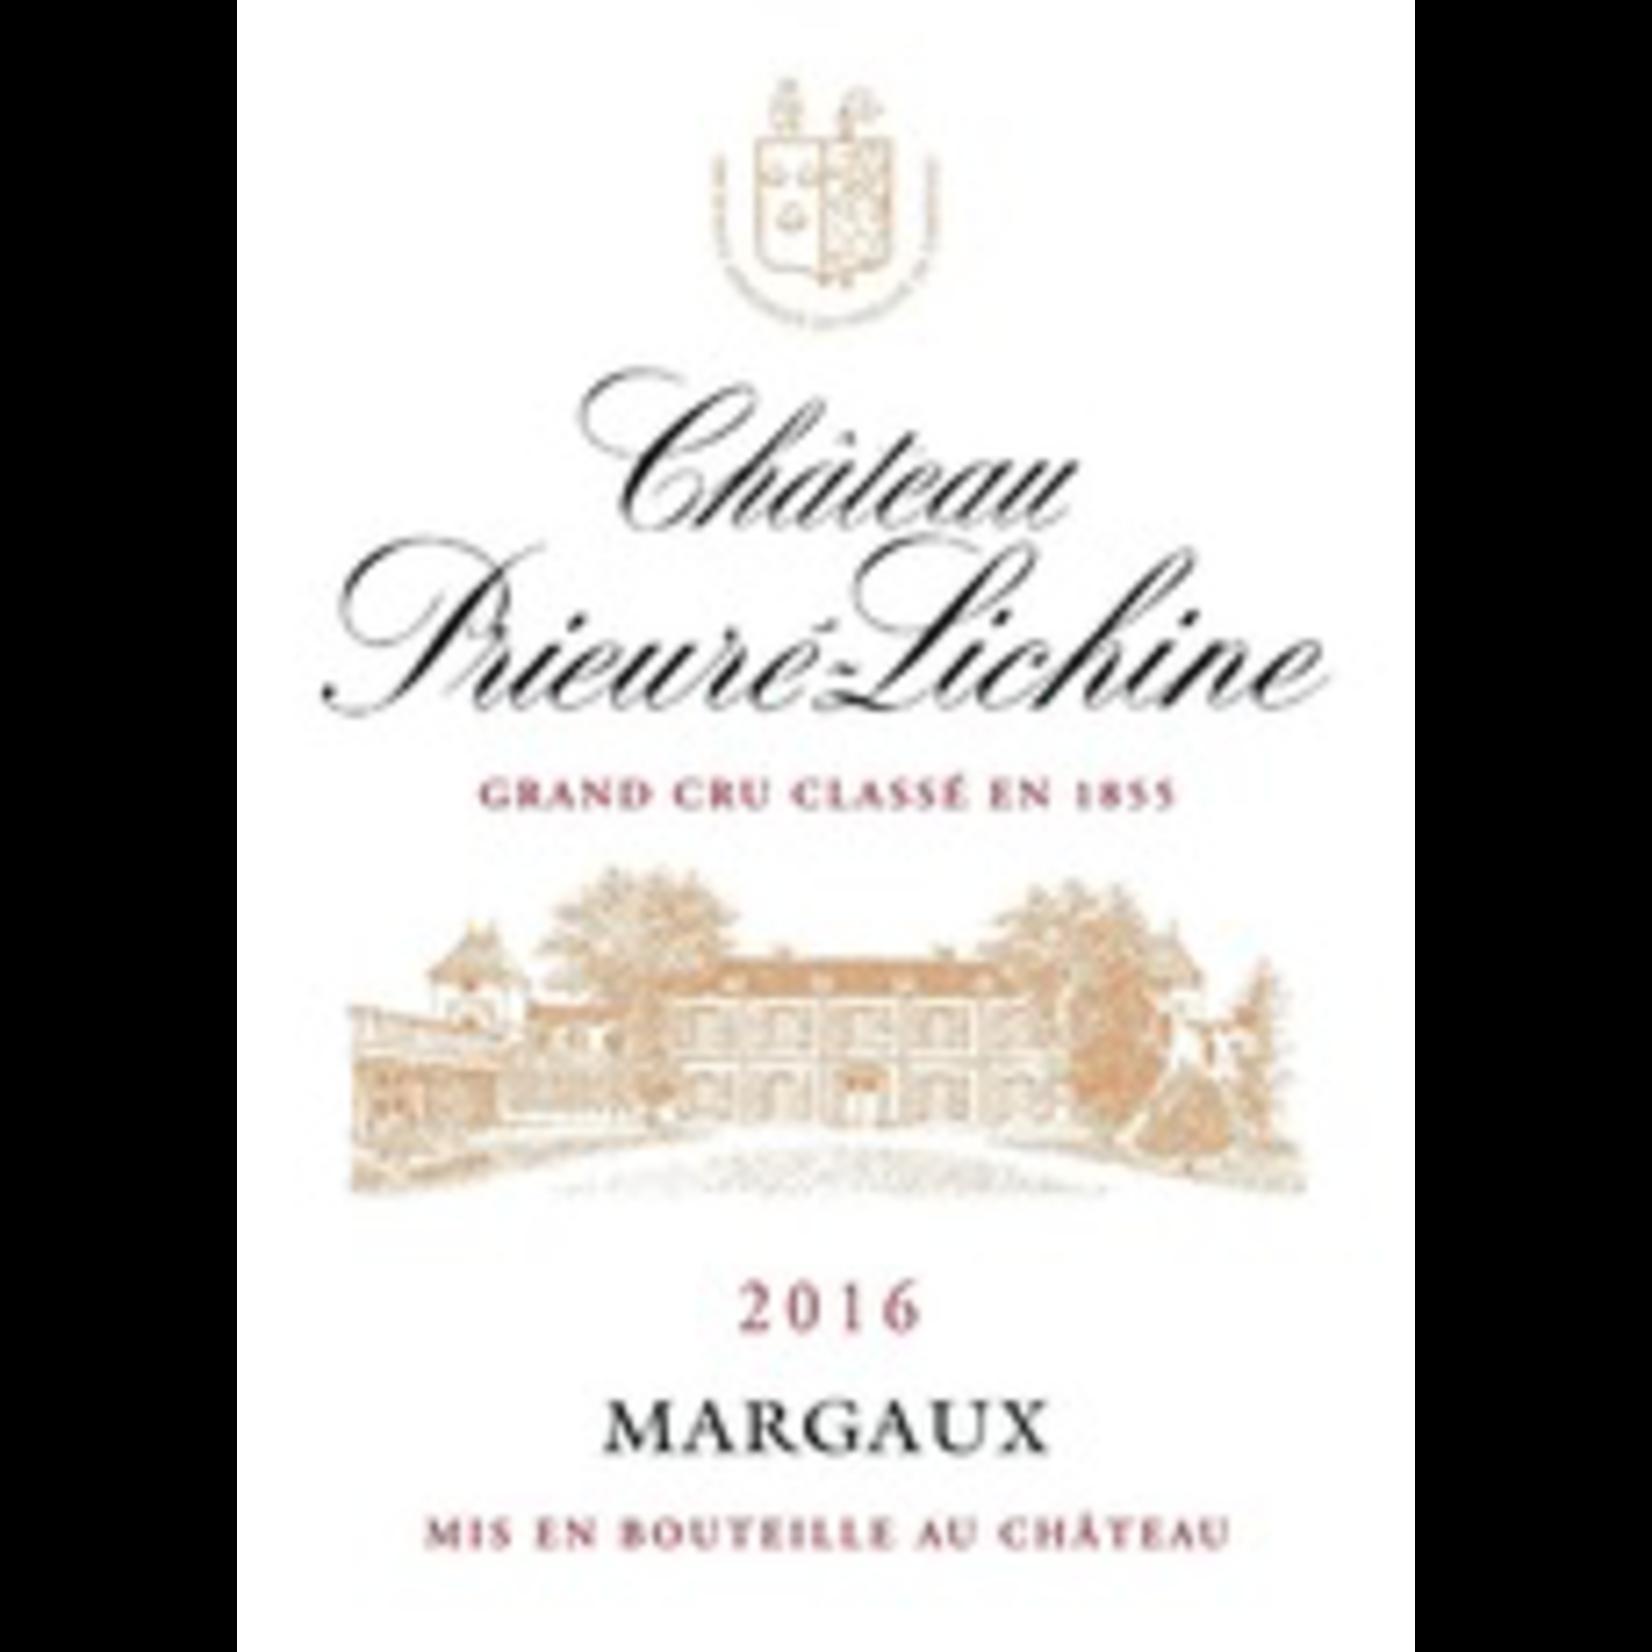 Wine Ch Prieure Lichine 2018